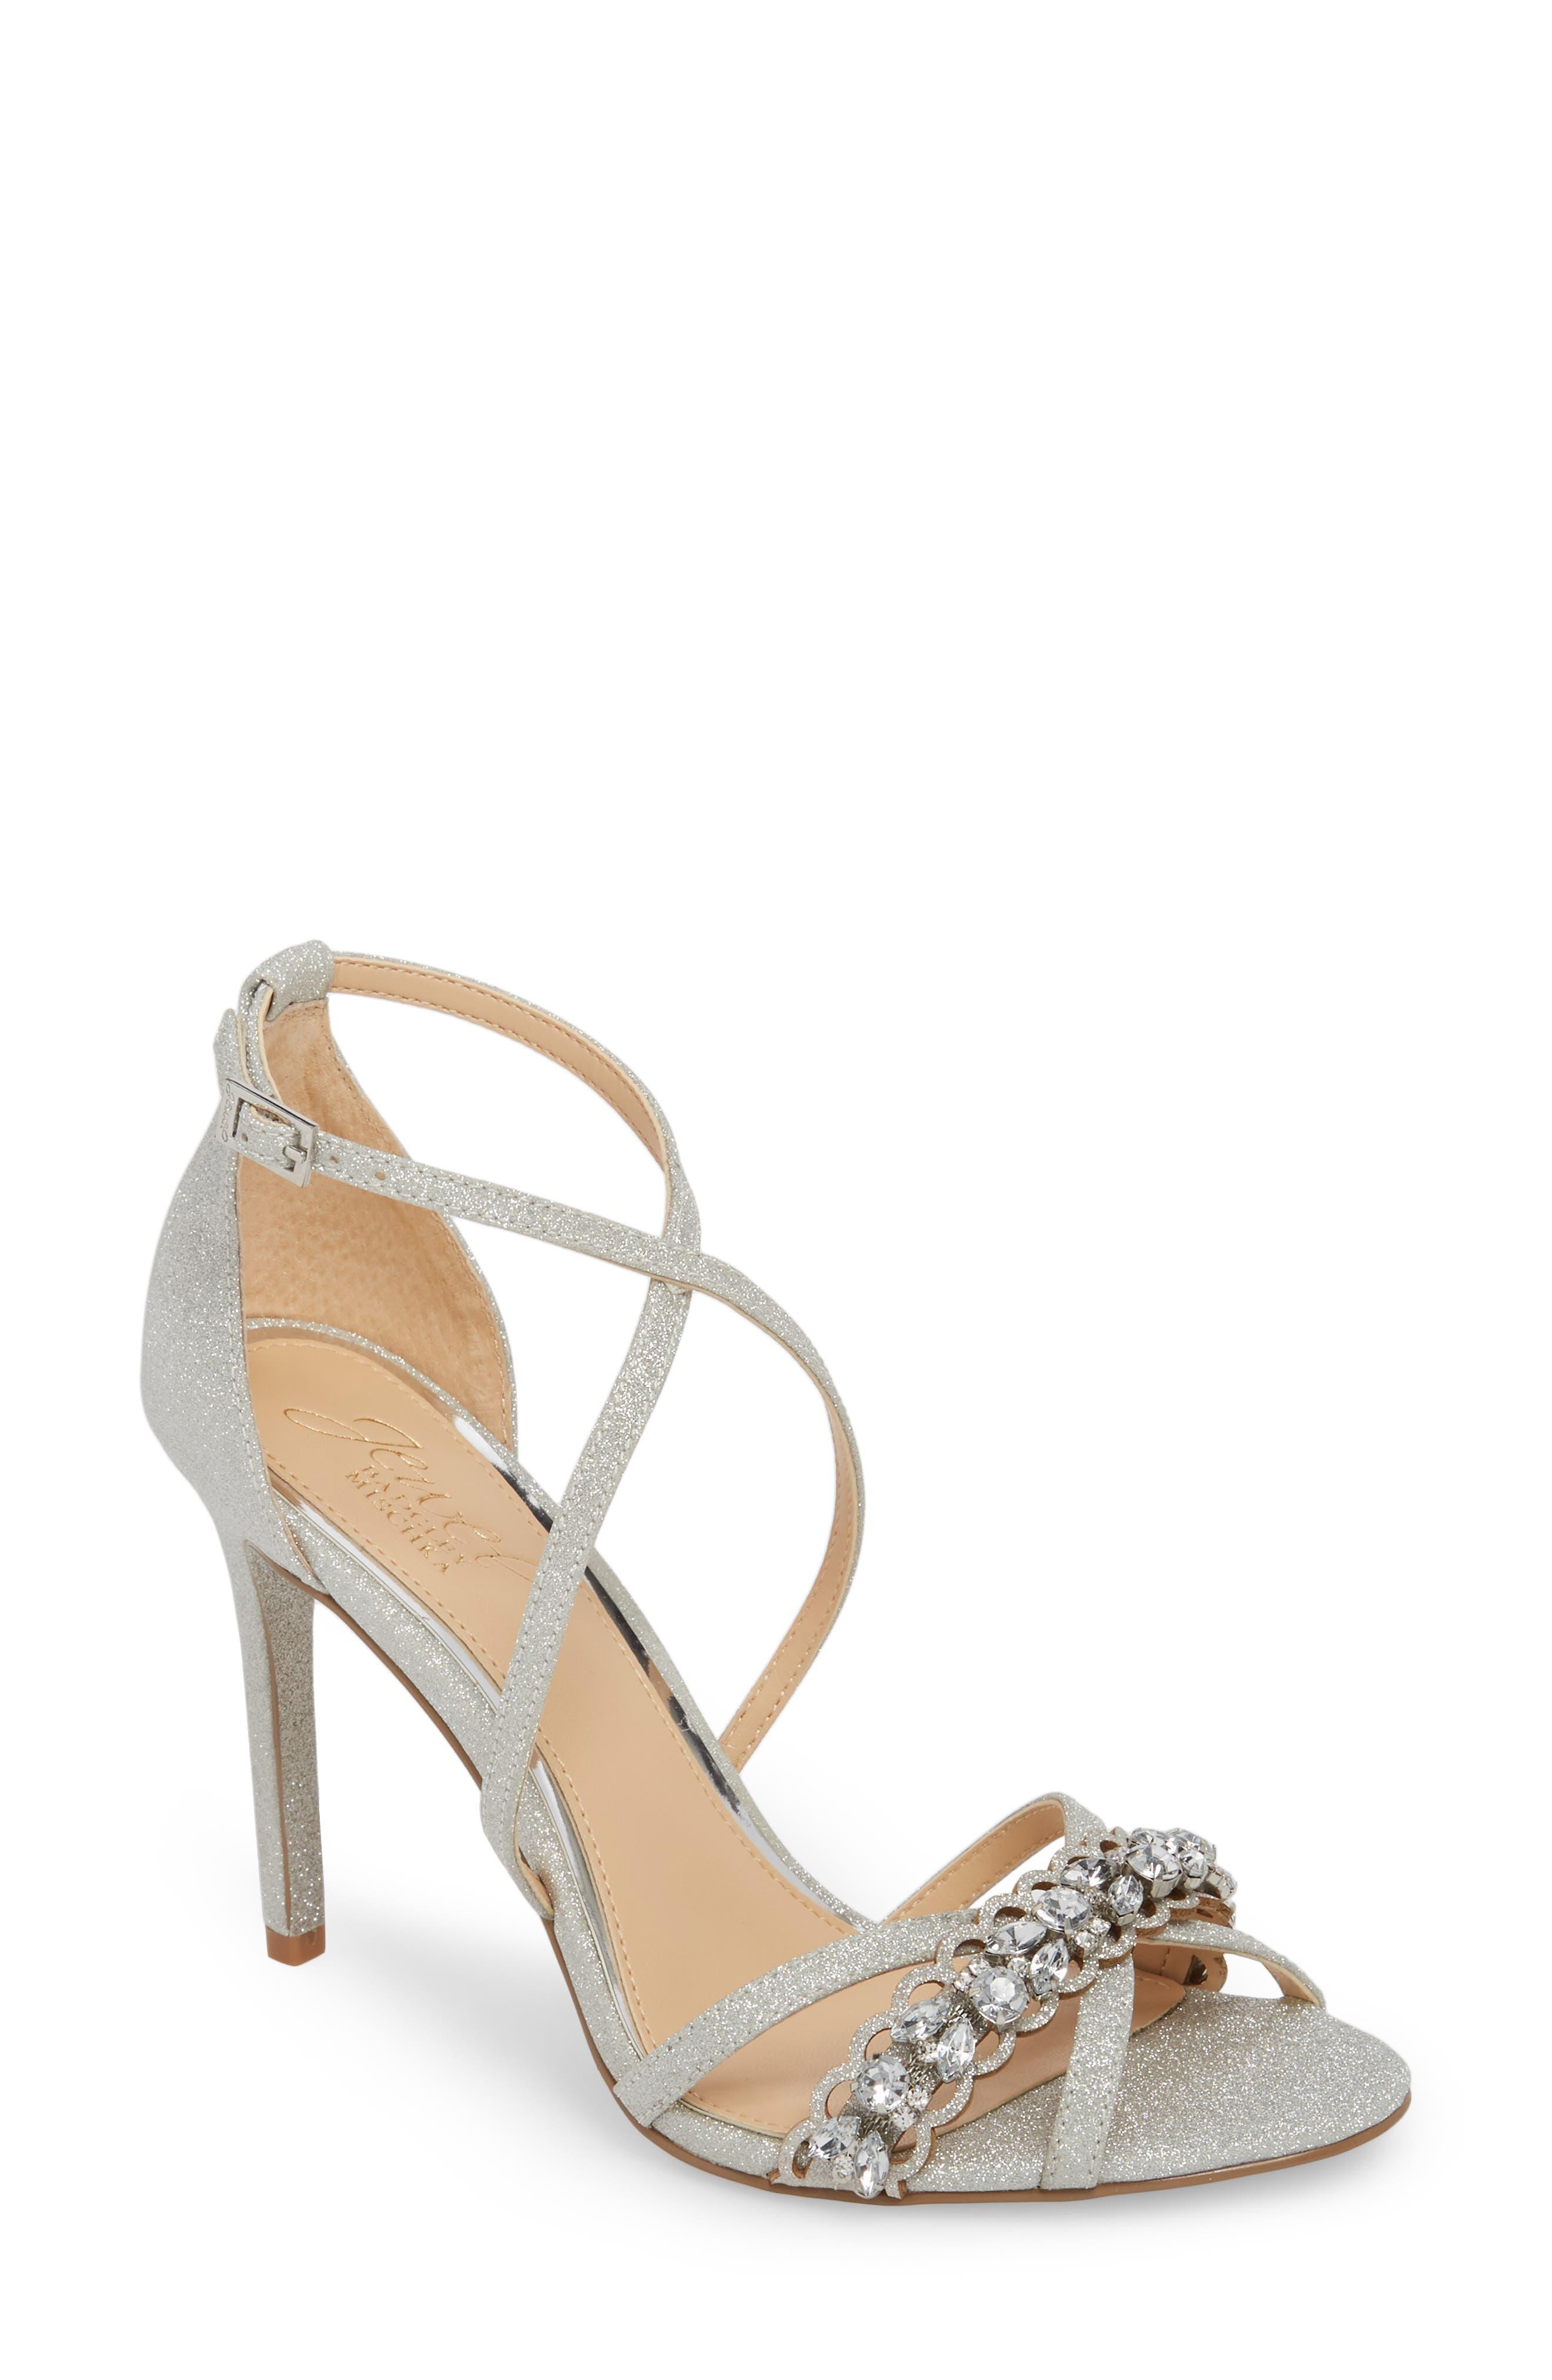 Jewel Badgley Mischka Gisele Sandal (Women)